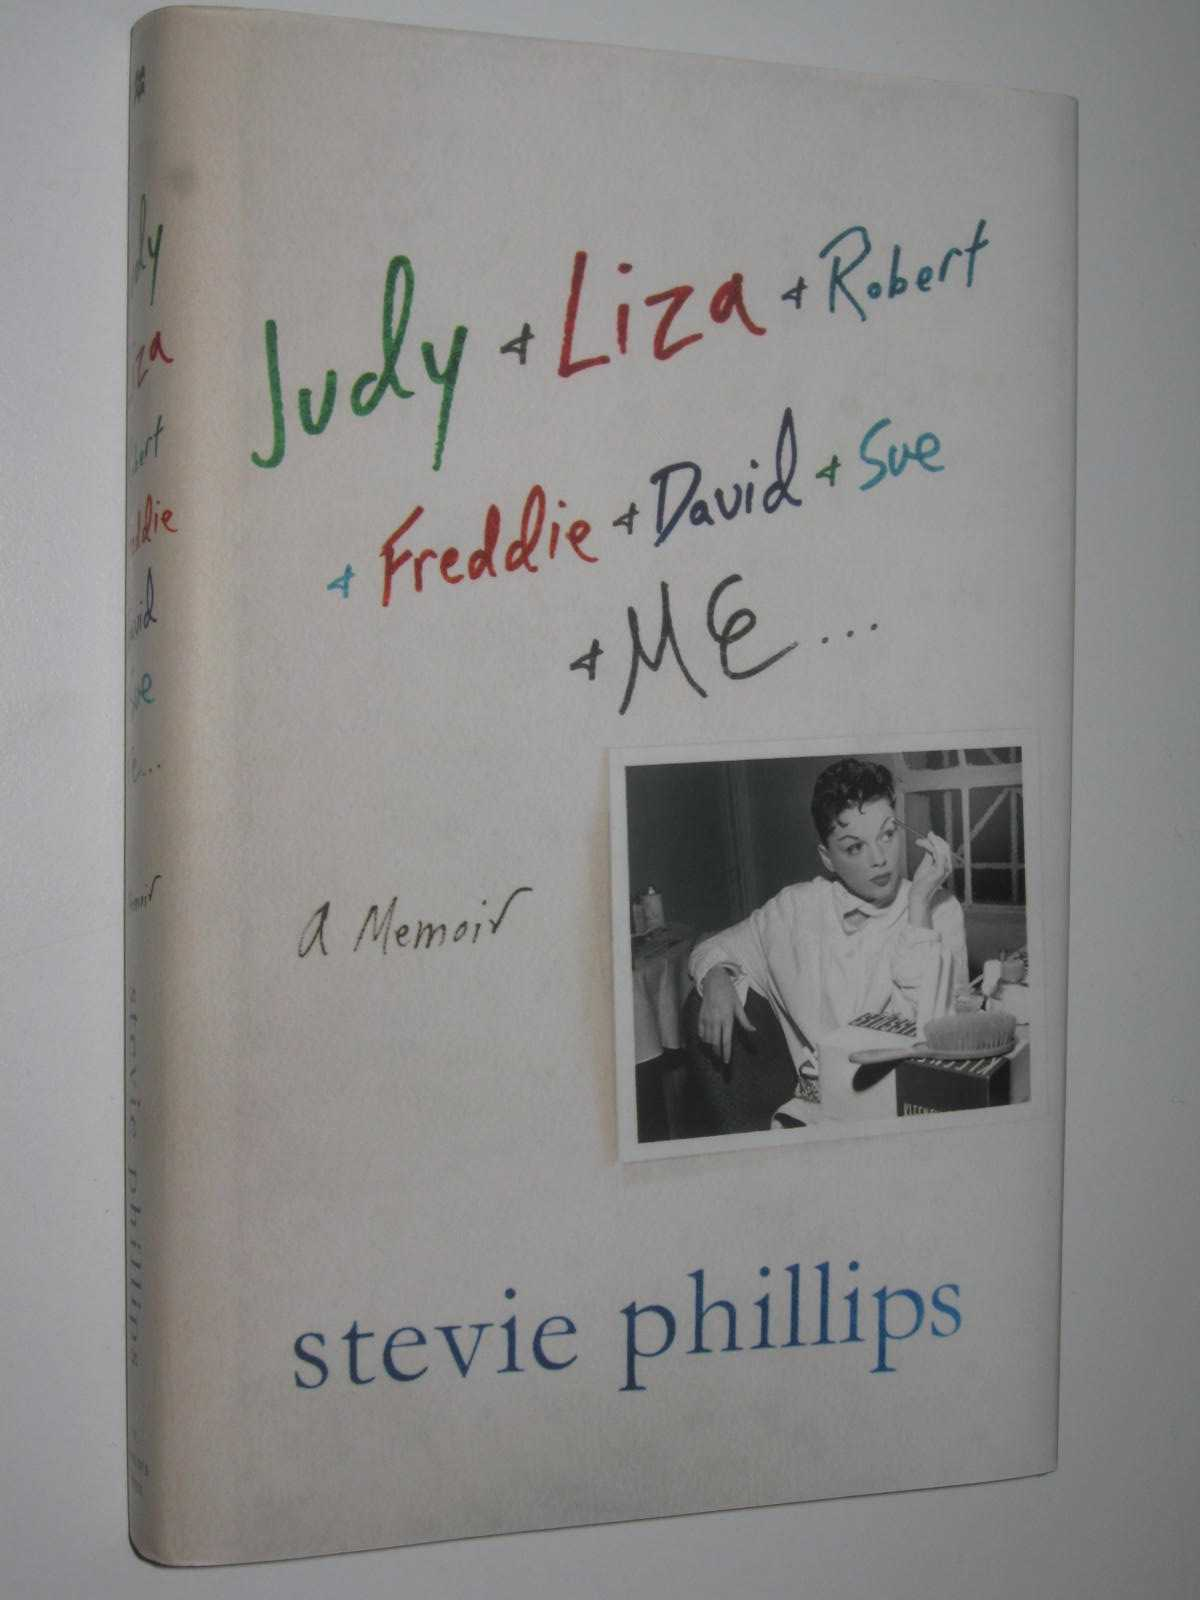 Image for Judy + Liza + Robert + Freddie + David + Sue + Me